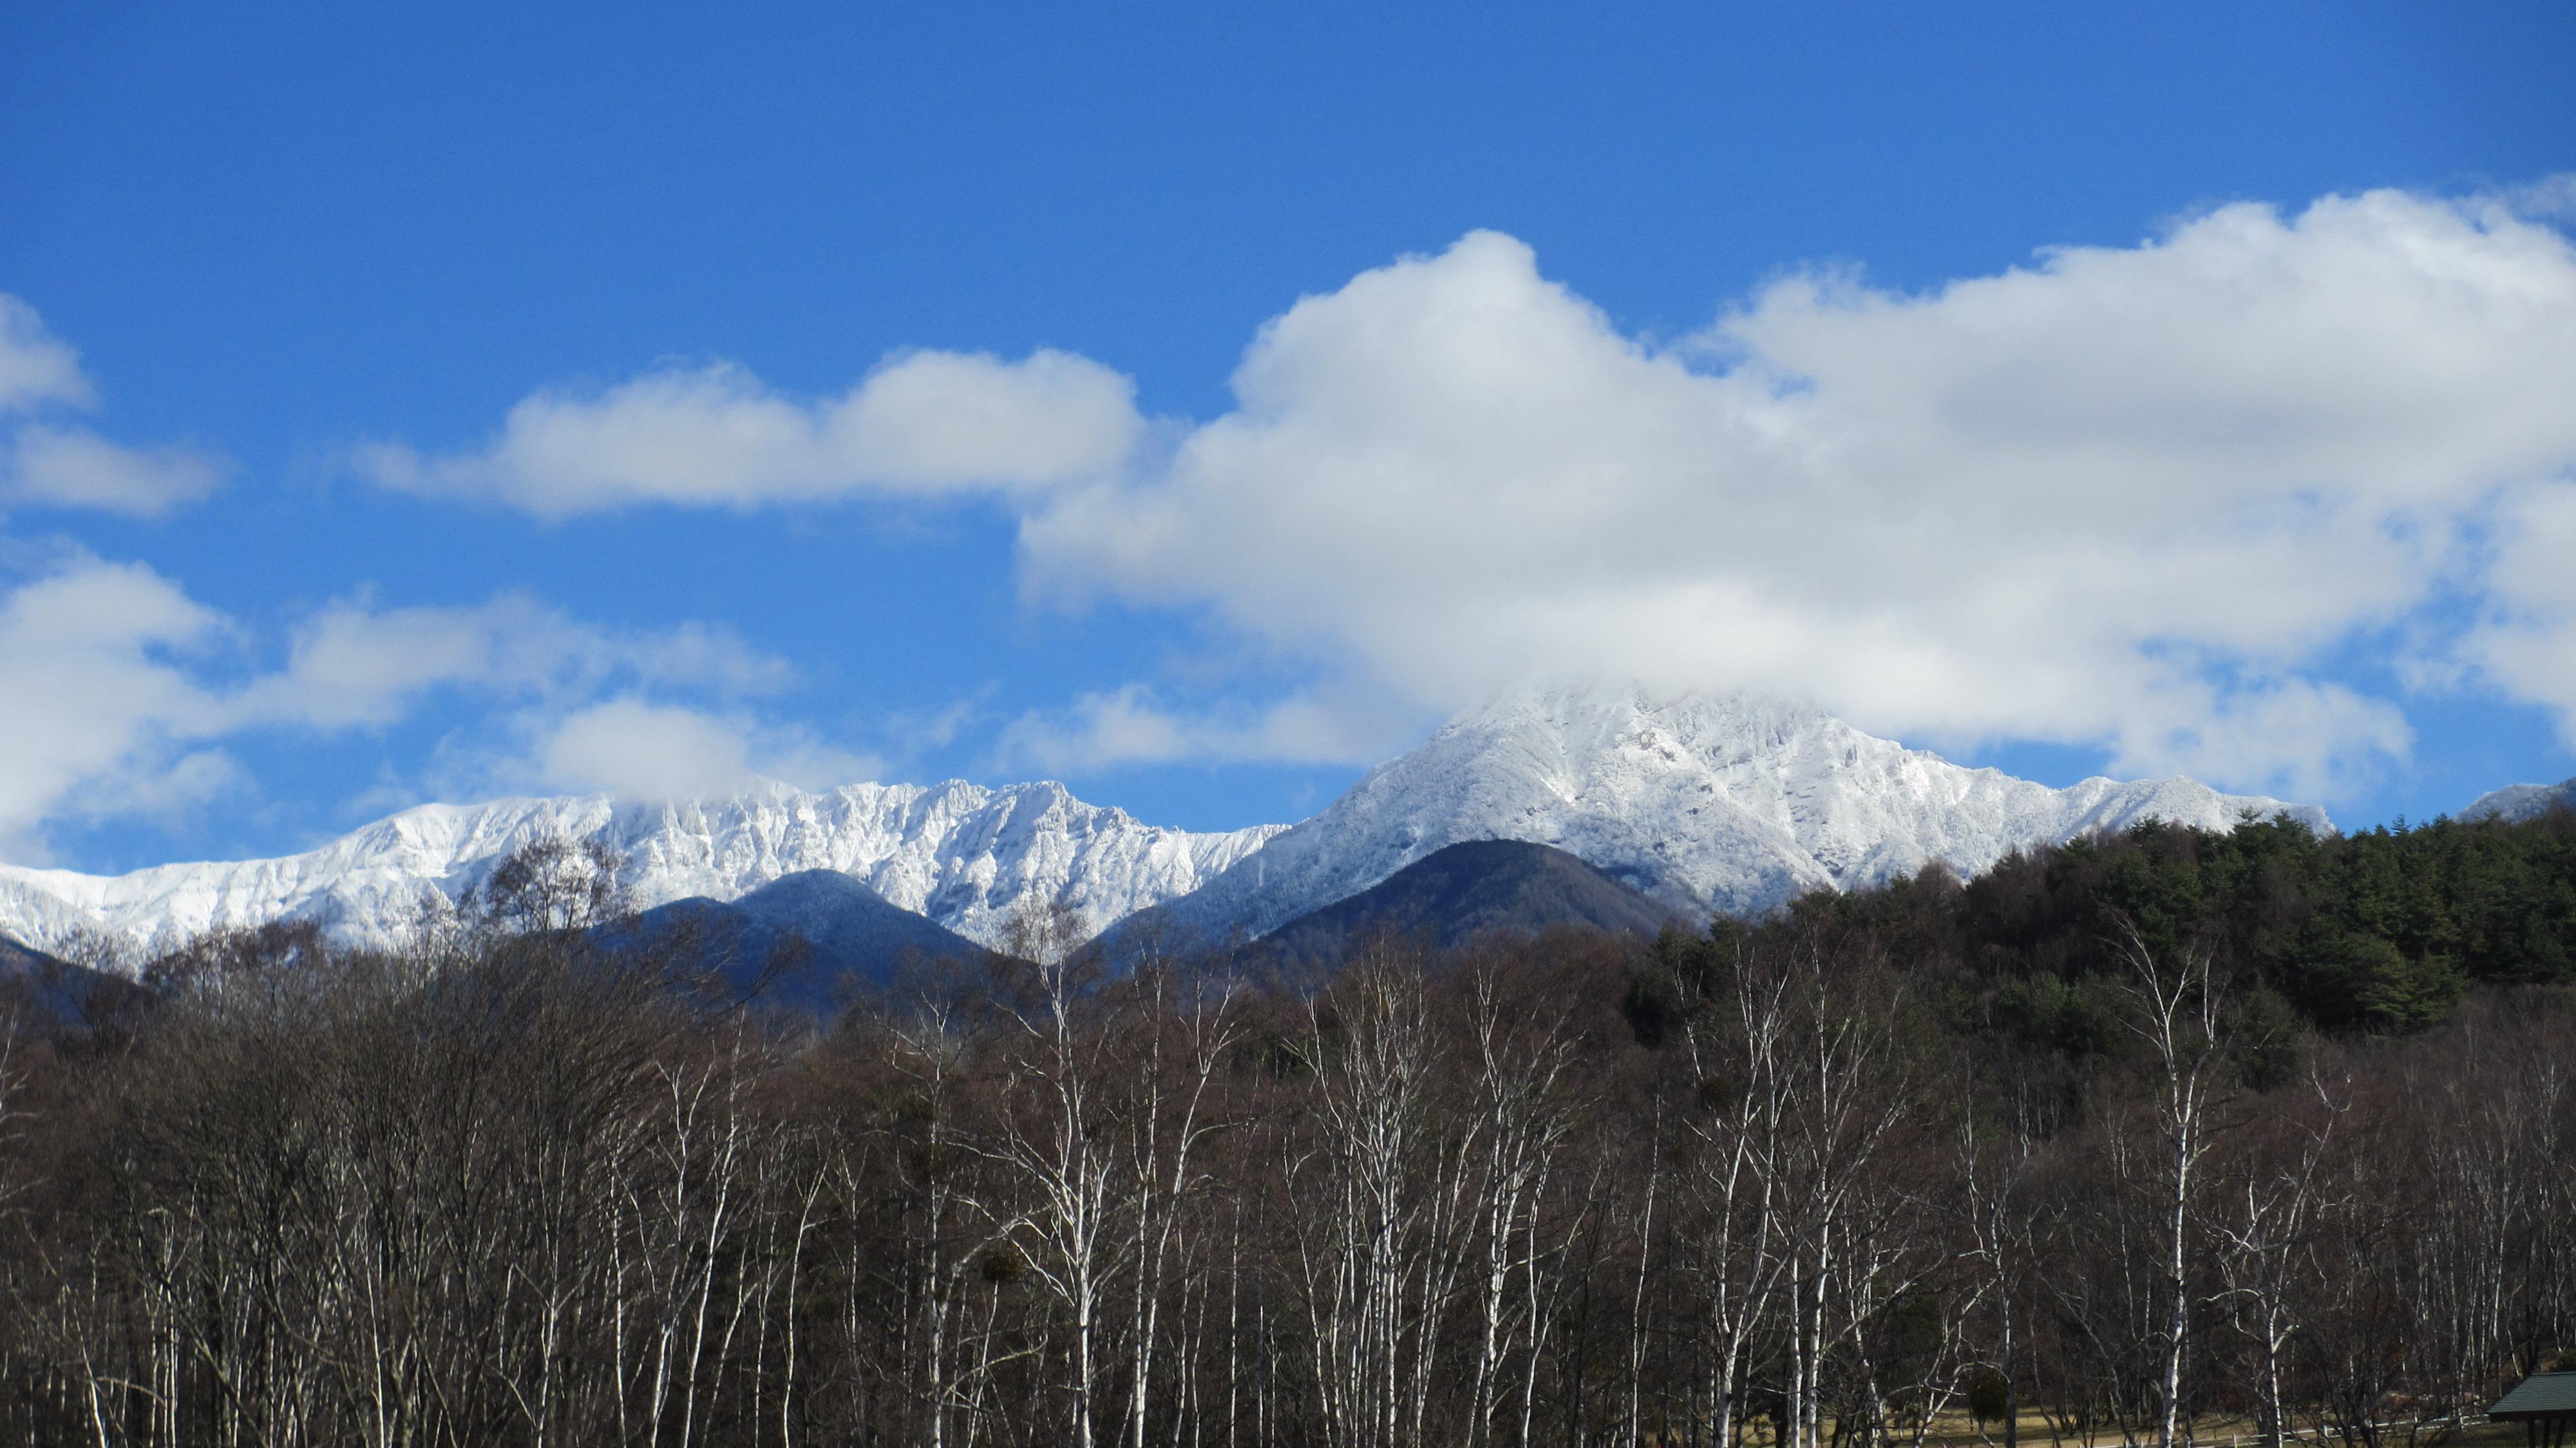 http://www.alpico.co.jp/shikinomori/news/images/IMG_5224.JPG